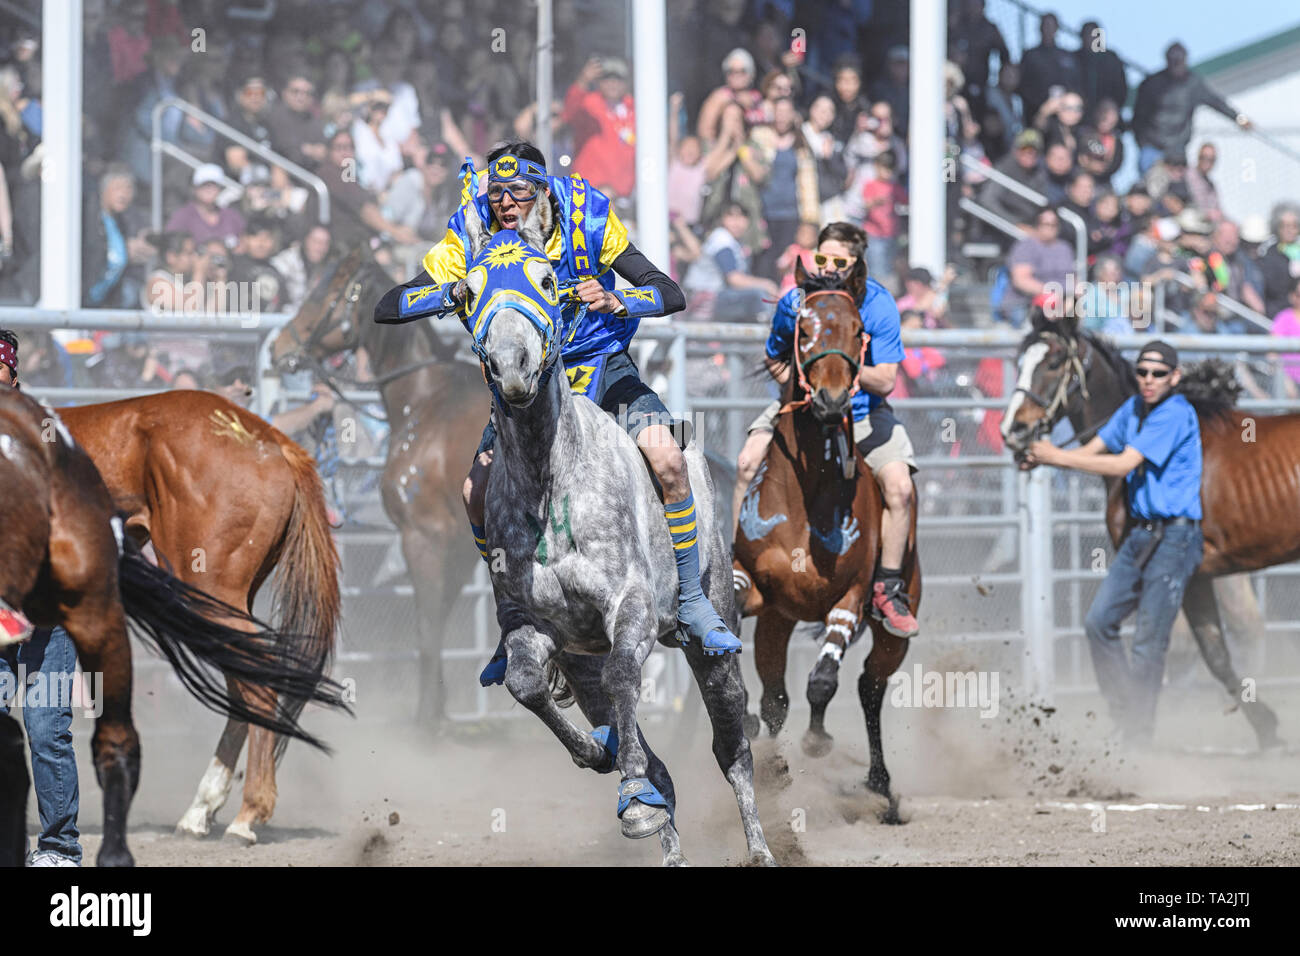 kehewin-first-nations-indian-relay-horse-race-held-in-bonnyville-alberta-canada-TA2JTJ.jpg